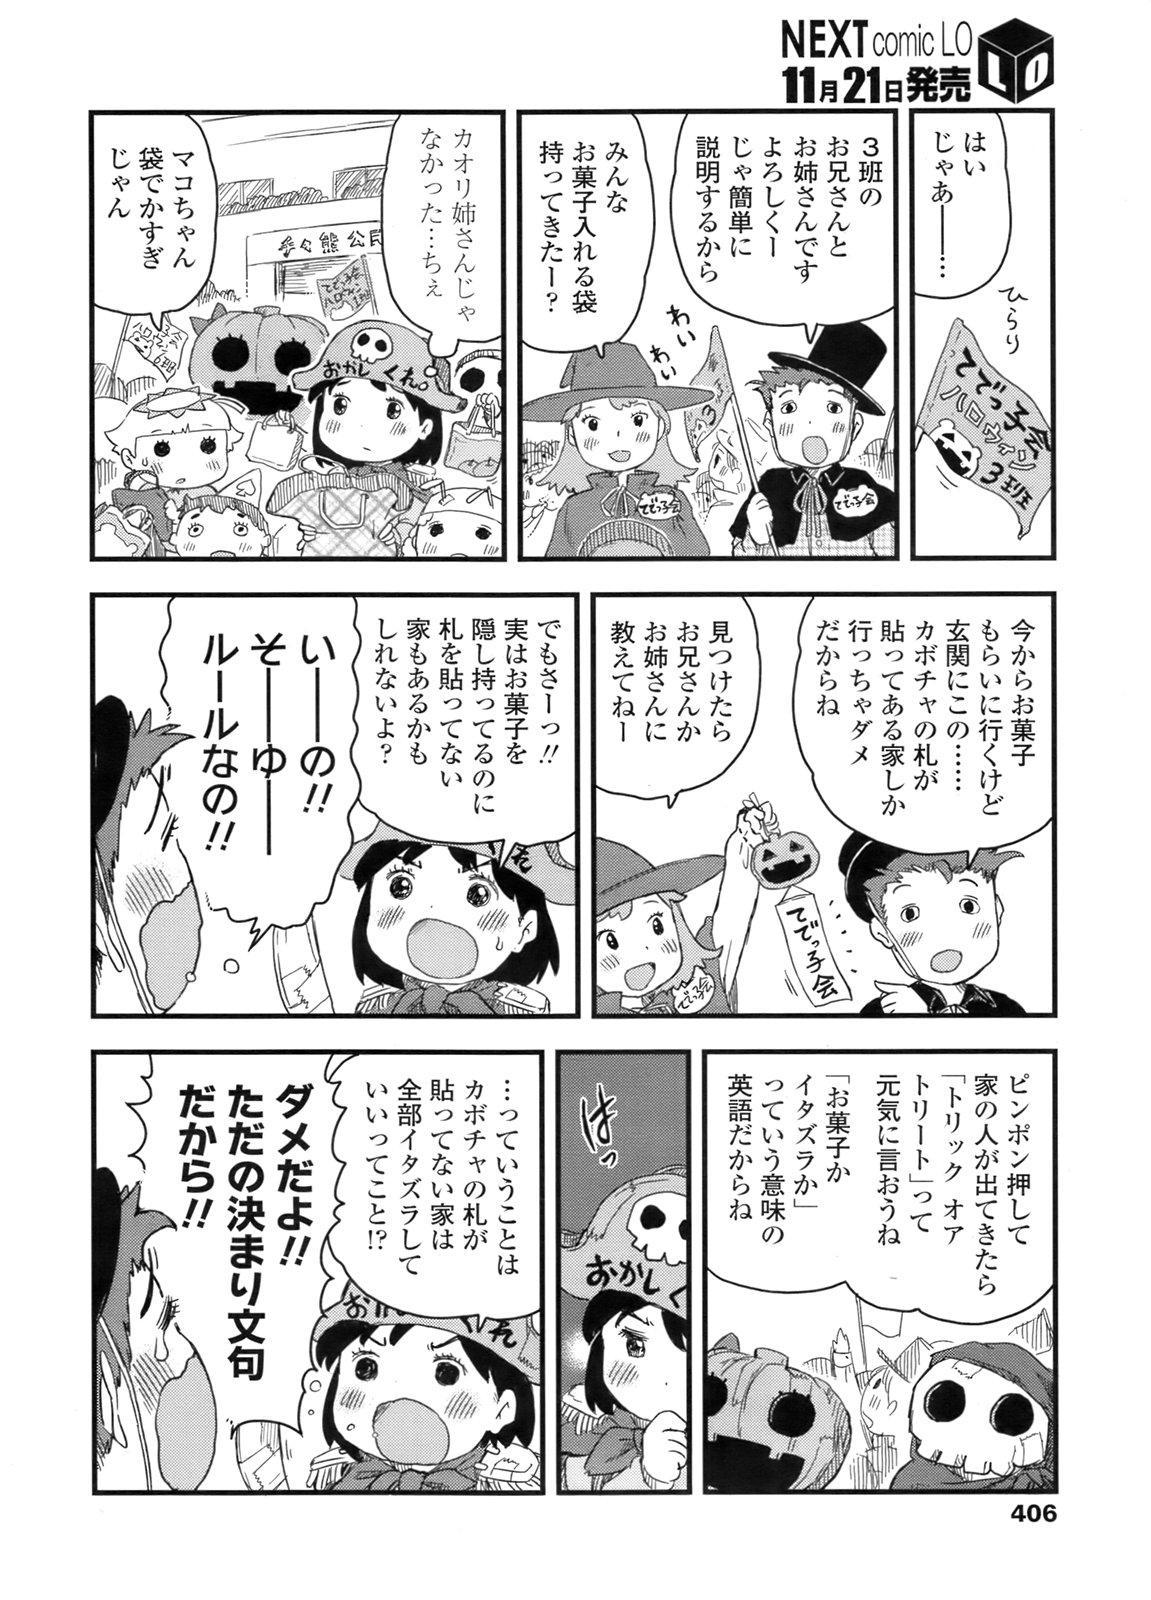 COMIC LO 2011-12 Vol. 93 406